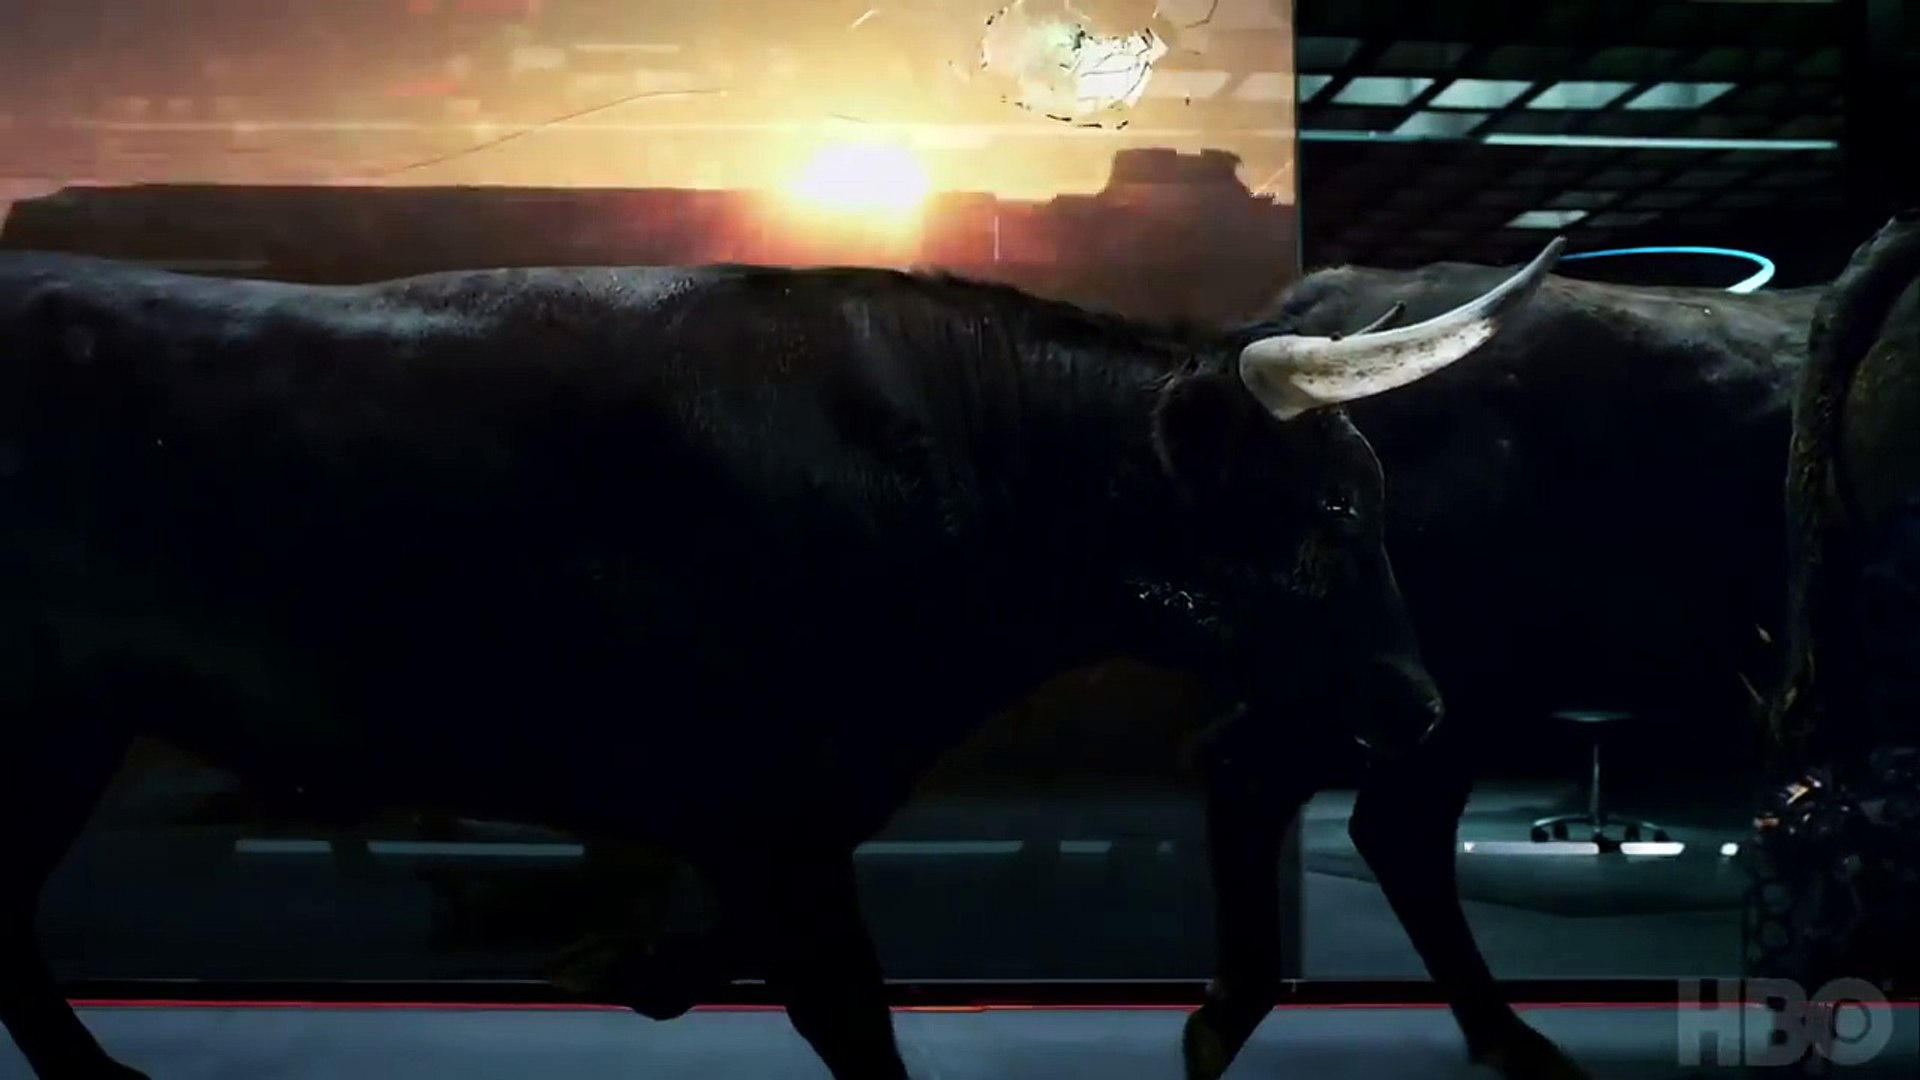 Westworld Season 2 Super Bowl TV Trailer - Movieclips Trailers